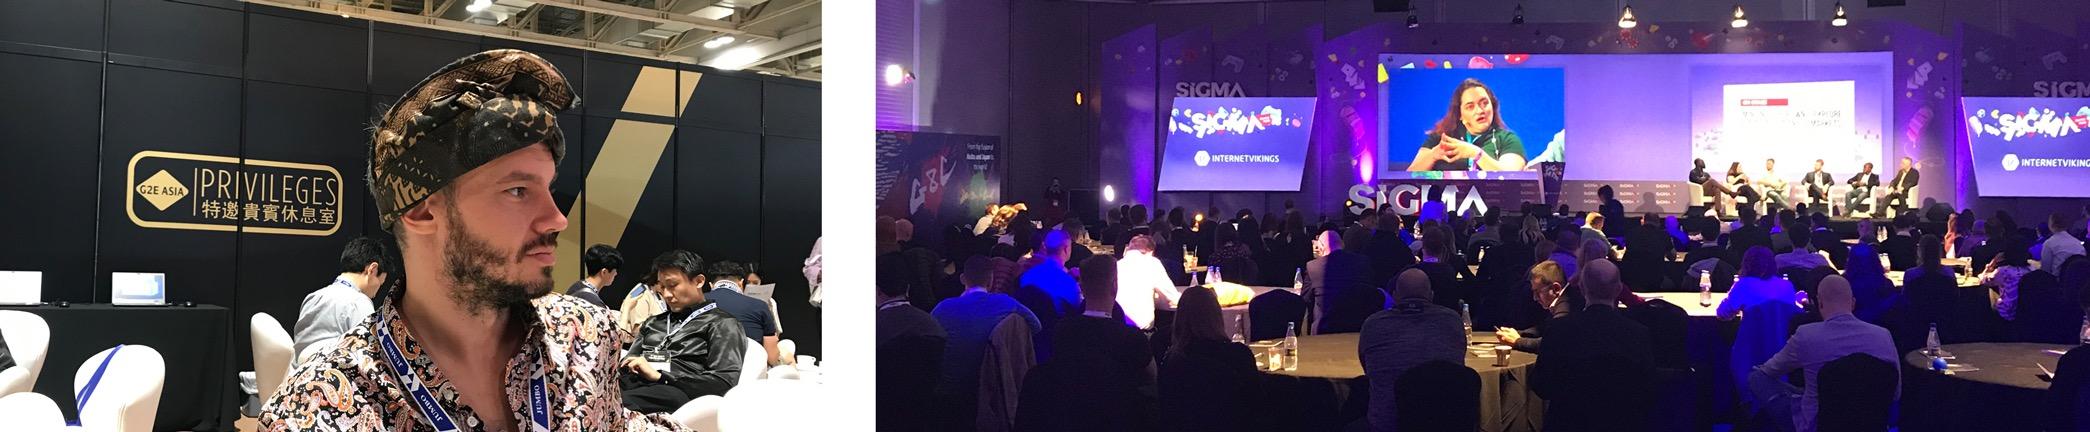 SmartCasinoGuide-in-Sigma-G2E-tiešsaistes spēļu konference